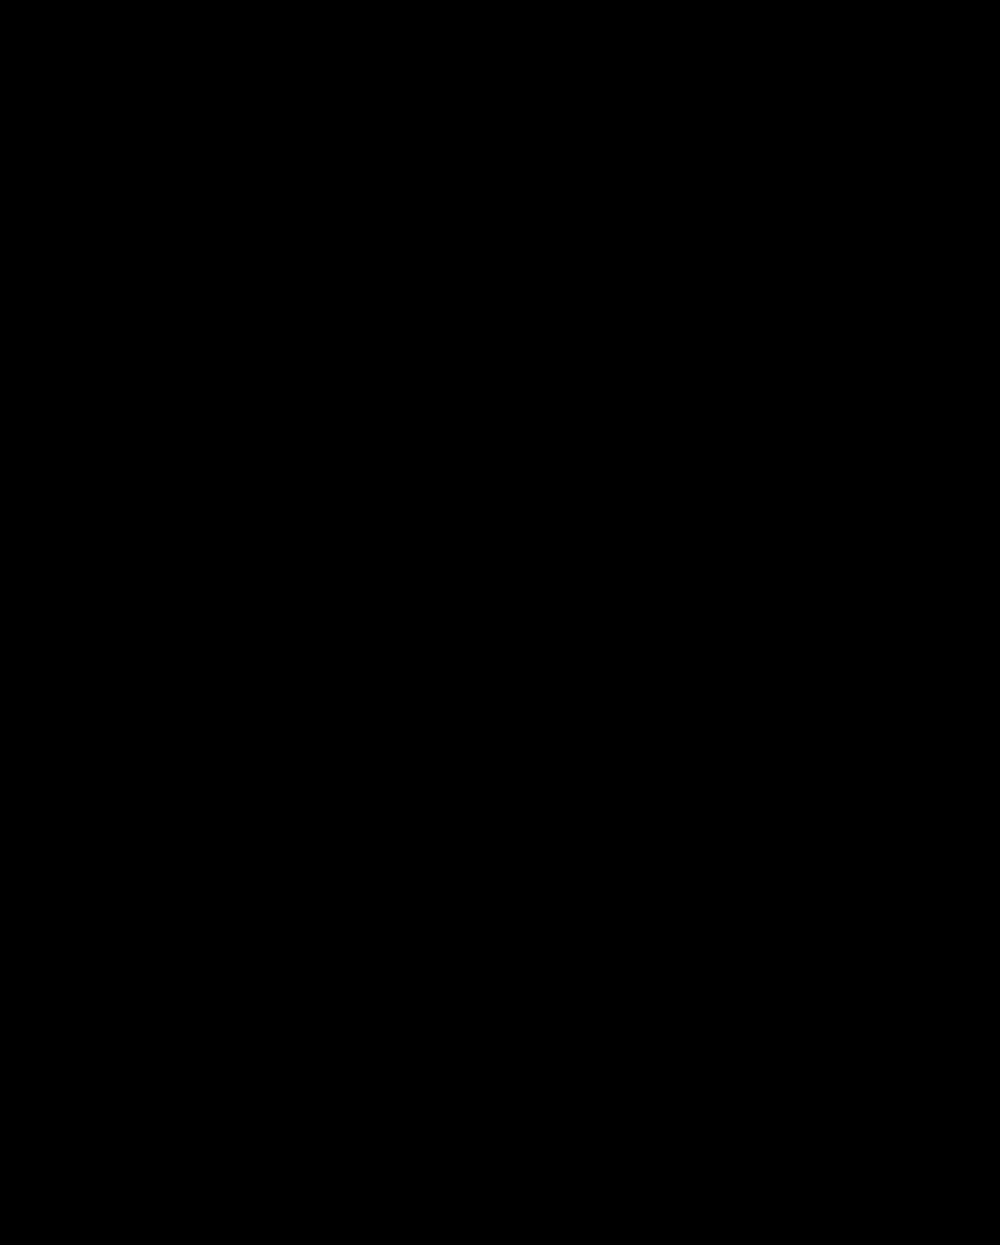 2905_Temple Cellars_B&W Logo-01.png